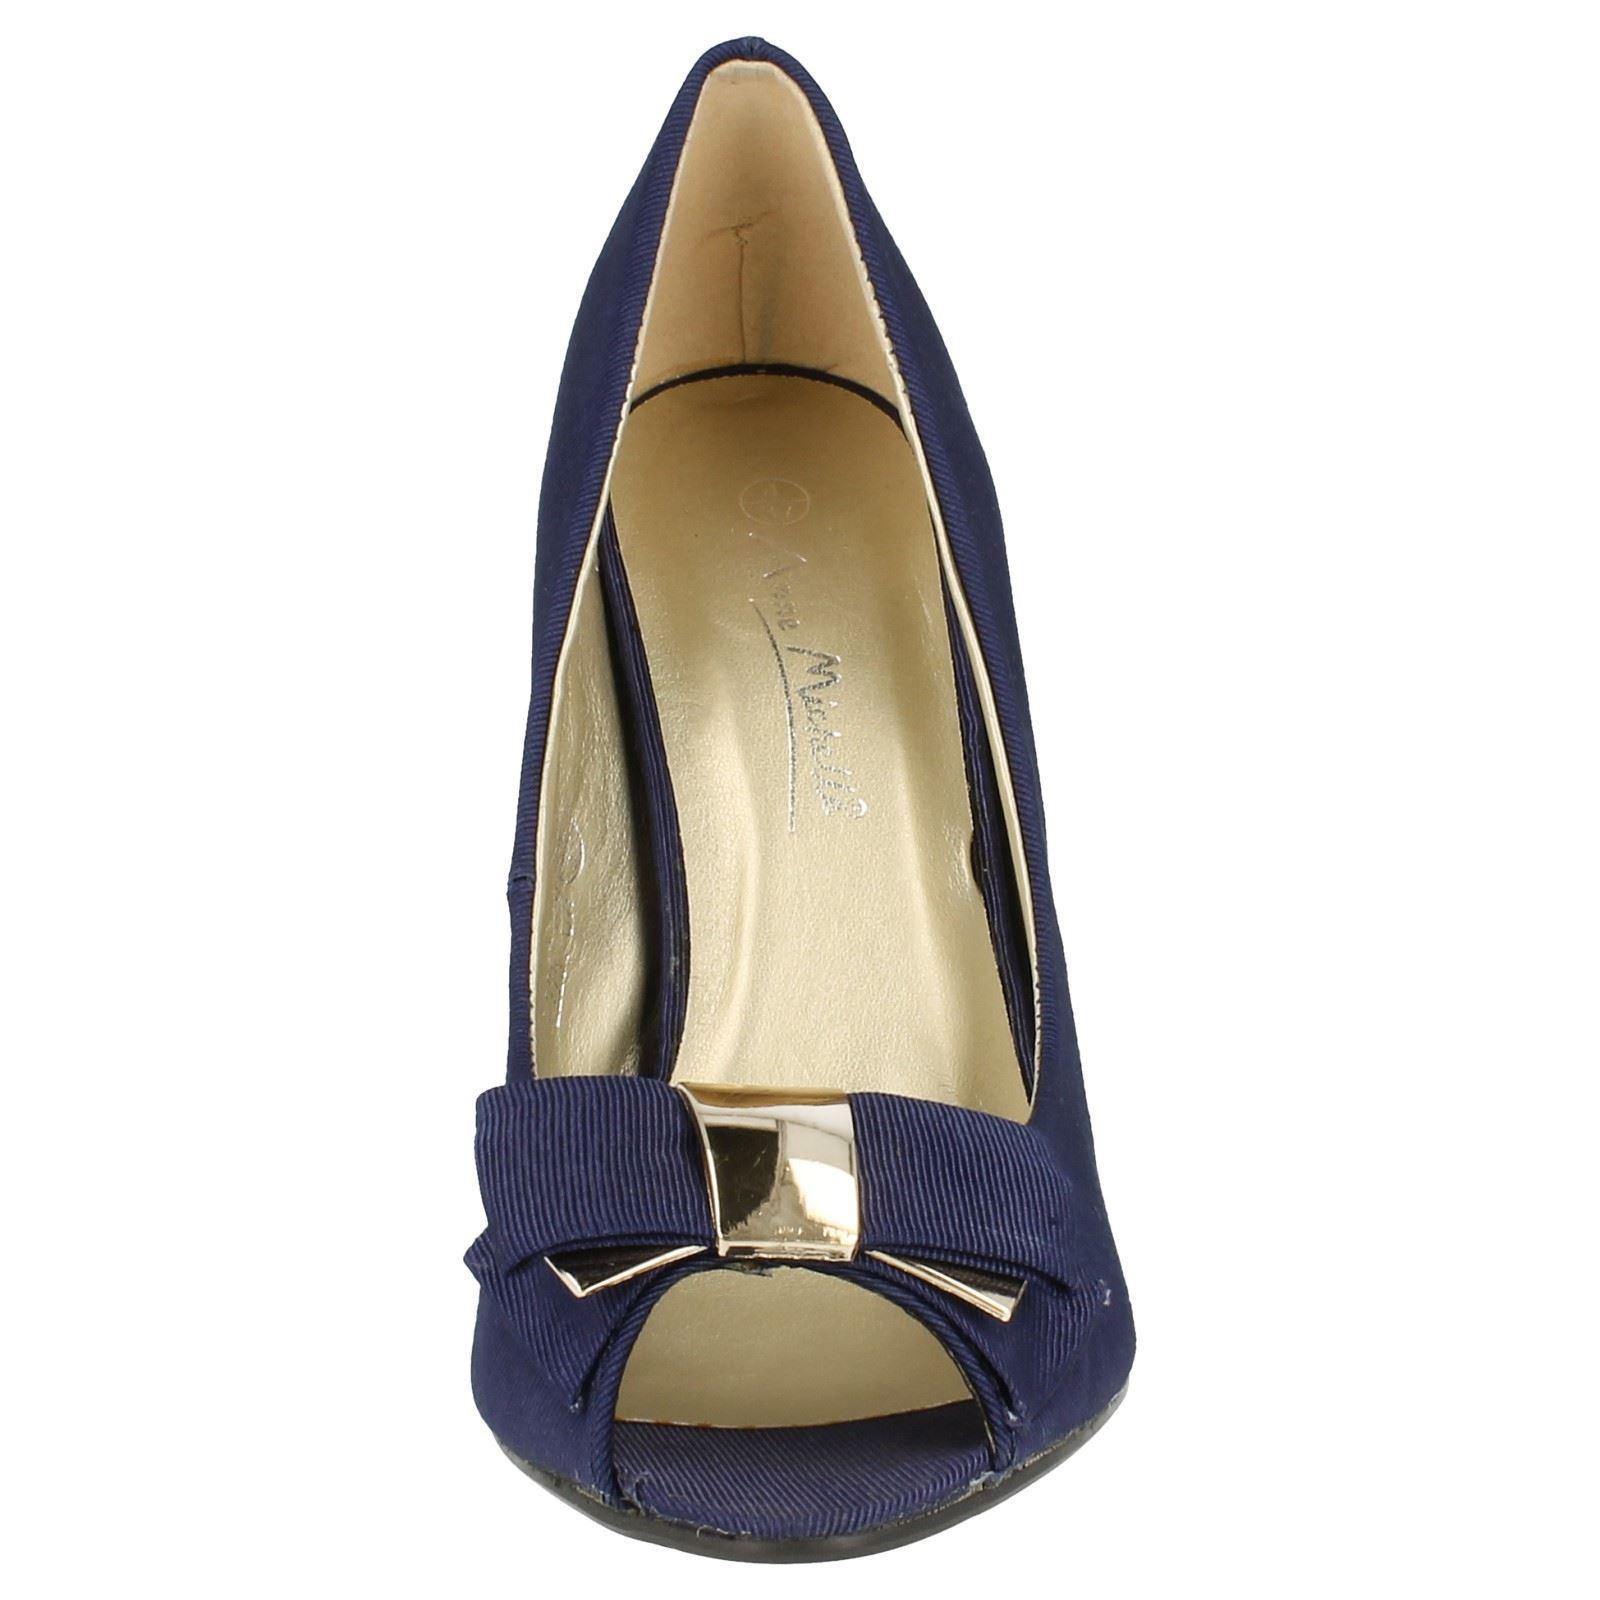 Damas Anne Michelle Tribunal de Punta Abierta Zapatos